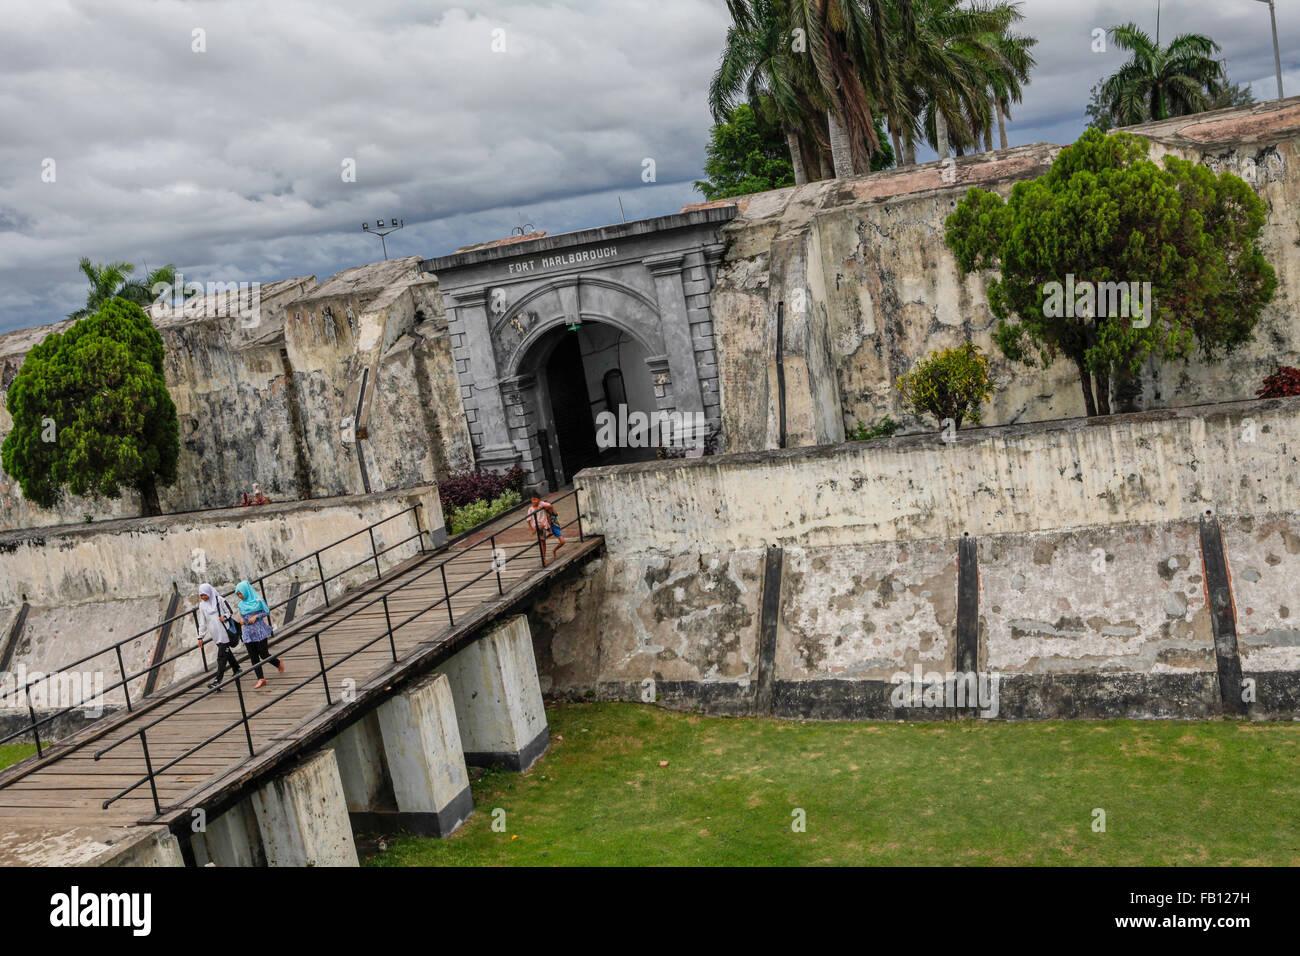 Local tourists walk on the bridge above the moat of Fort Marlborough in Bengkulu, Sumatra. - Stock Image